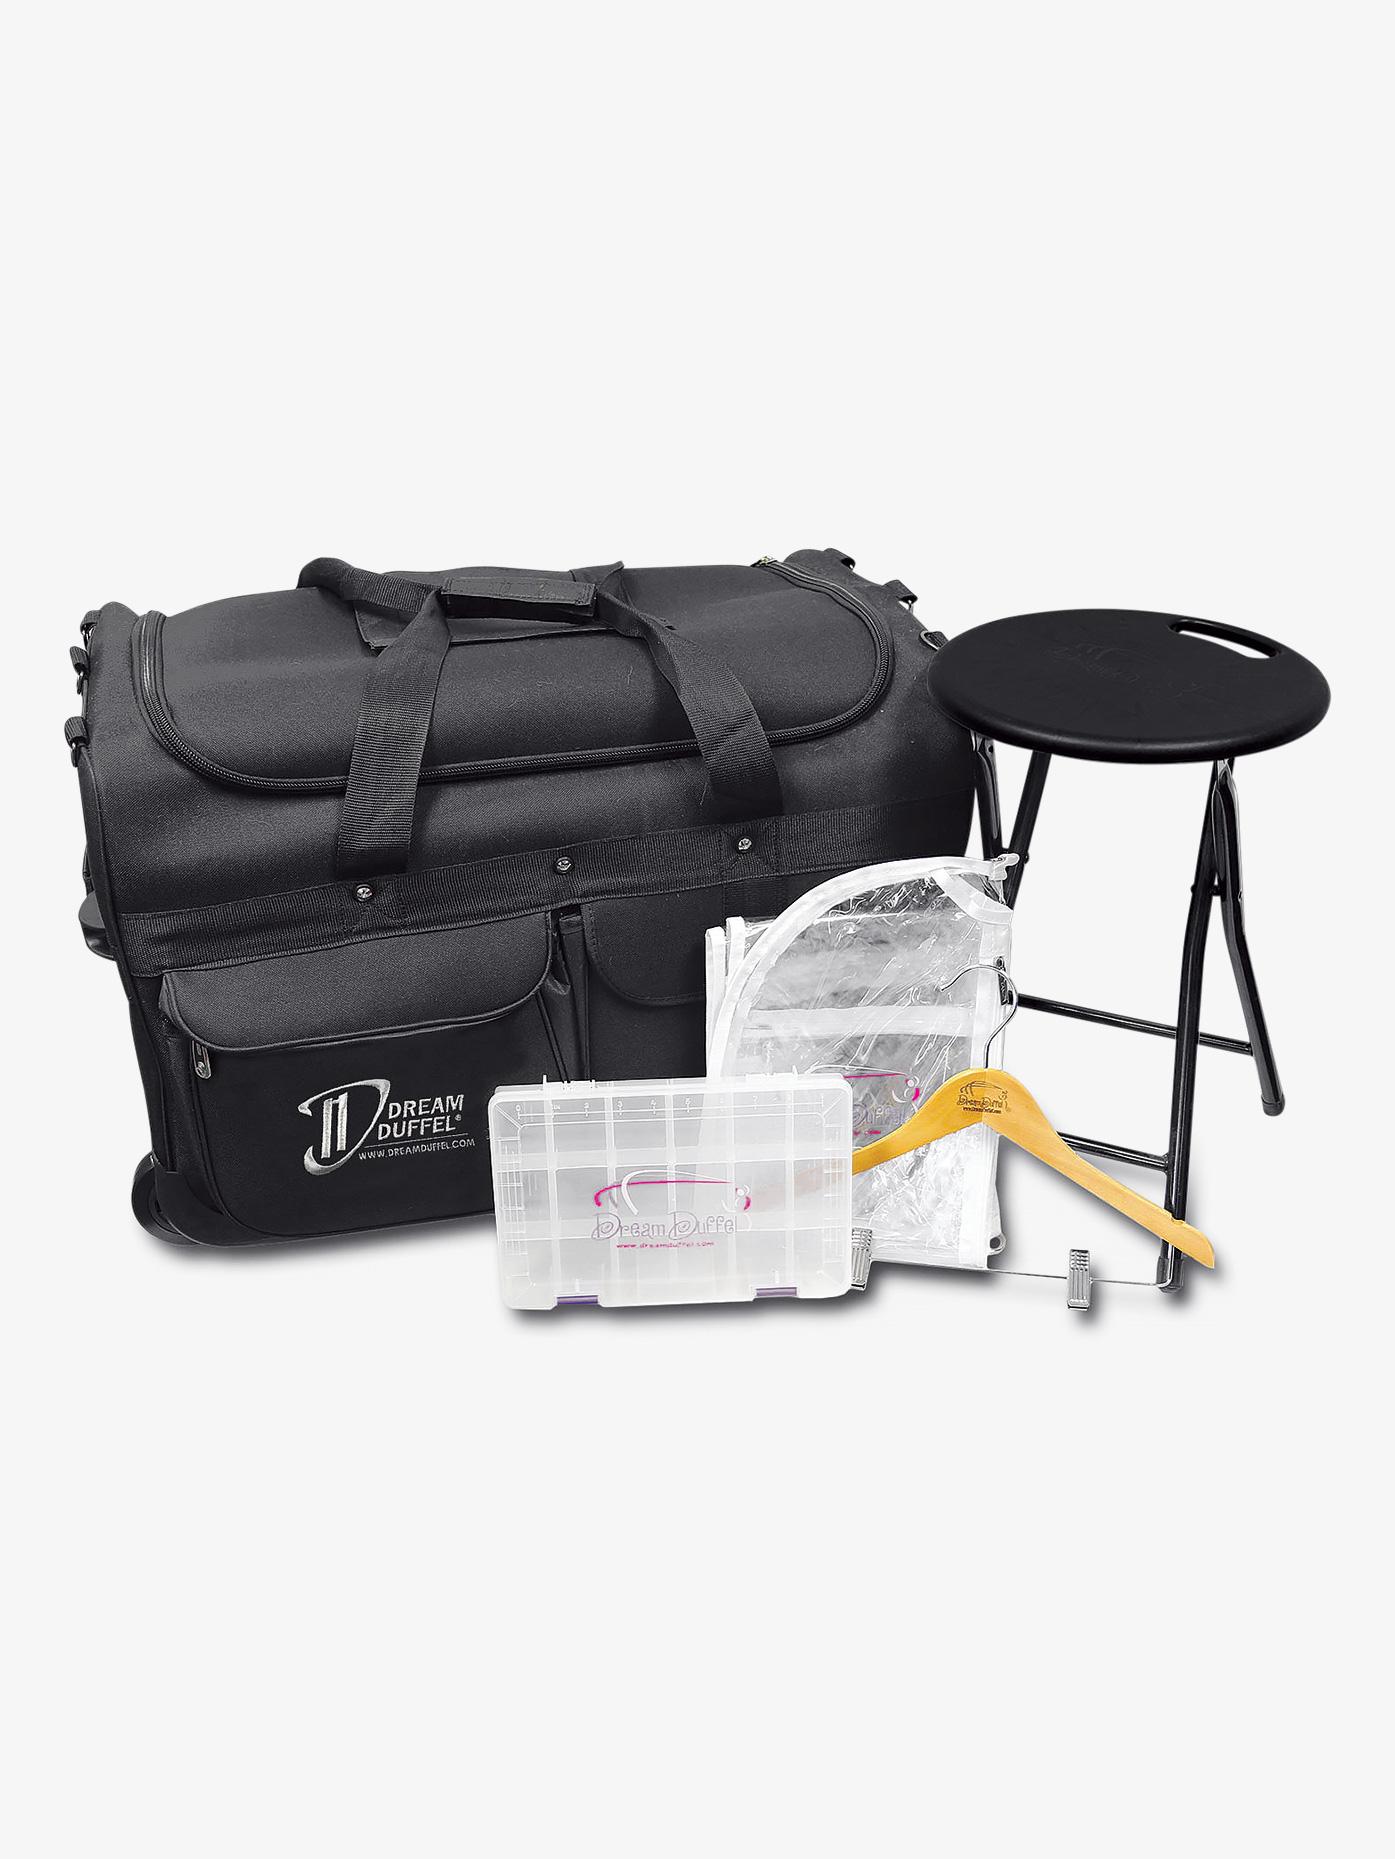 Dream Duffel Medium Black Bag Complete Pack D1100CP